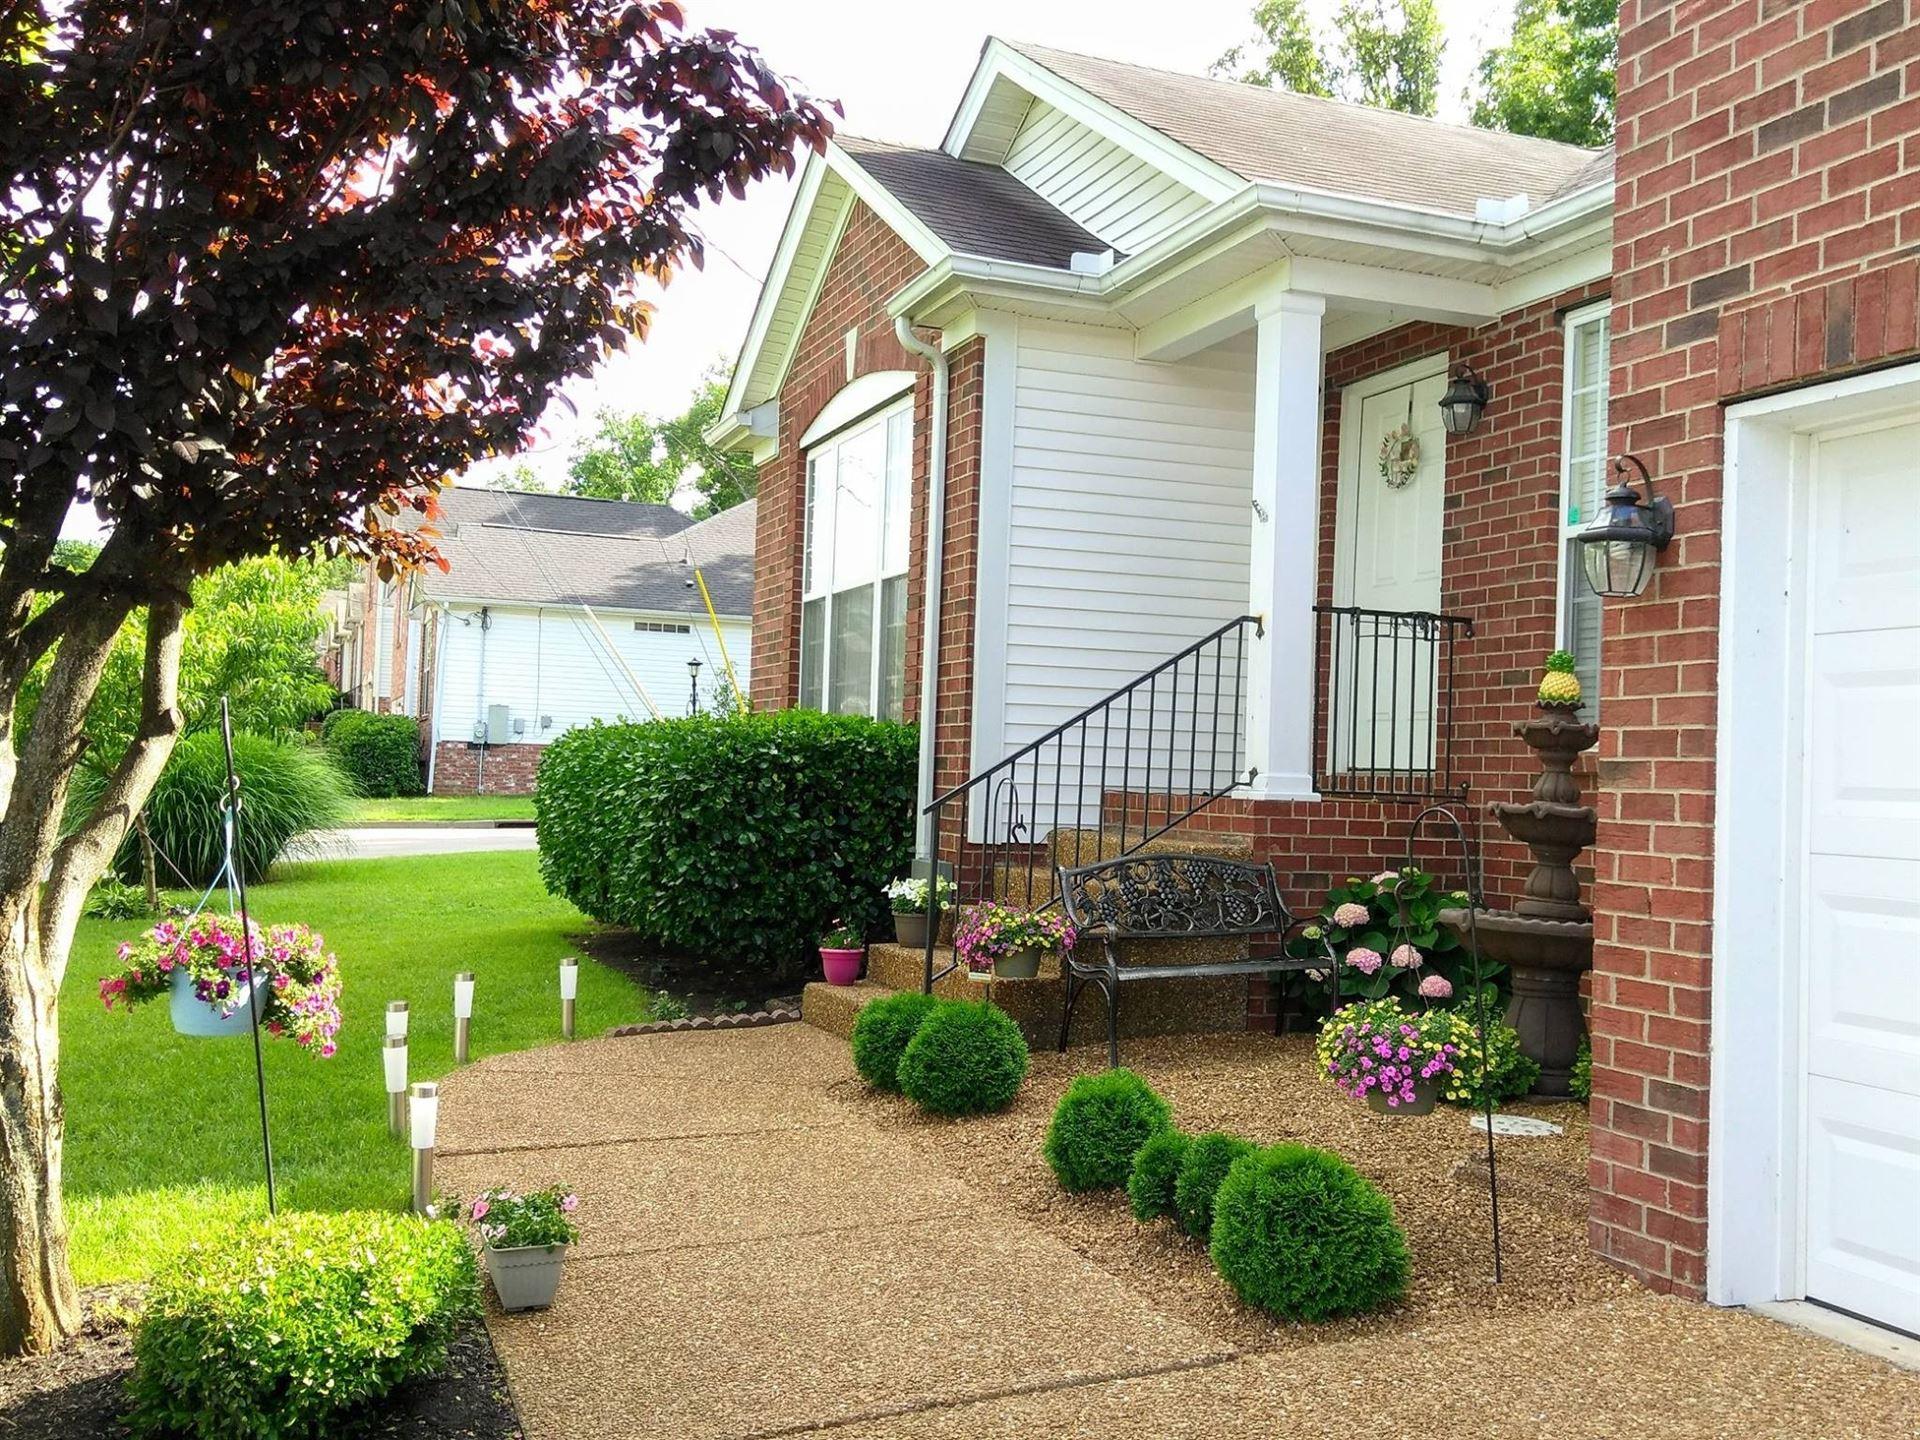 3101 Demetros Pl, Nashville, TN 37217 - MLS#: 2256904